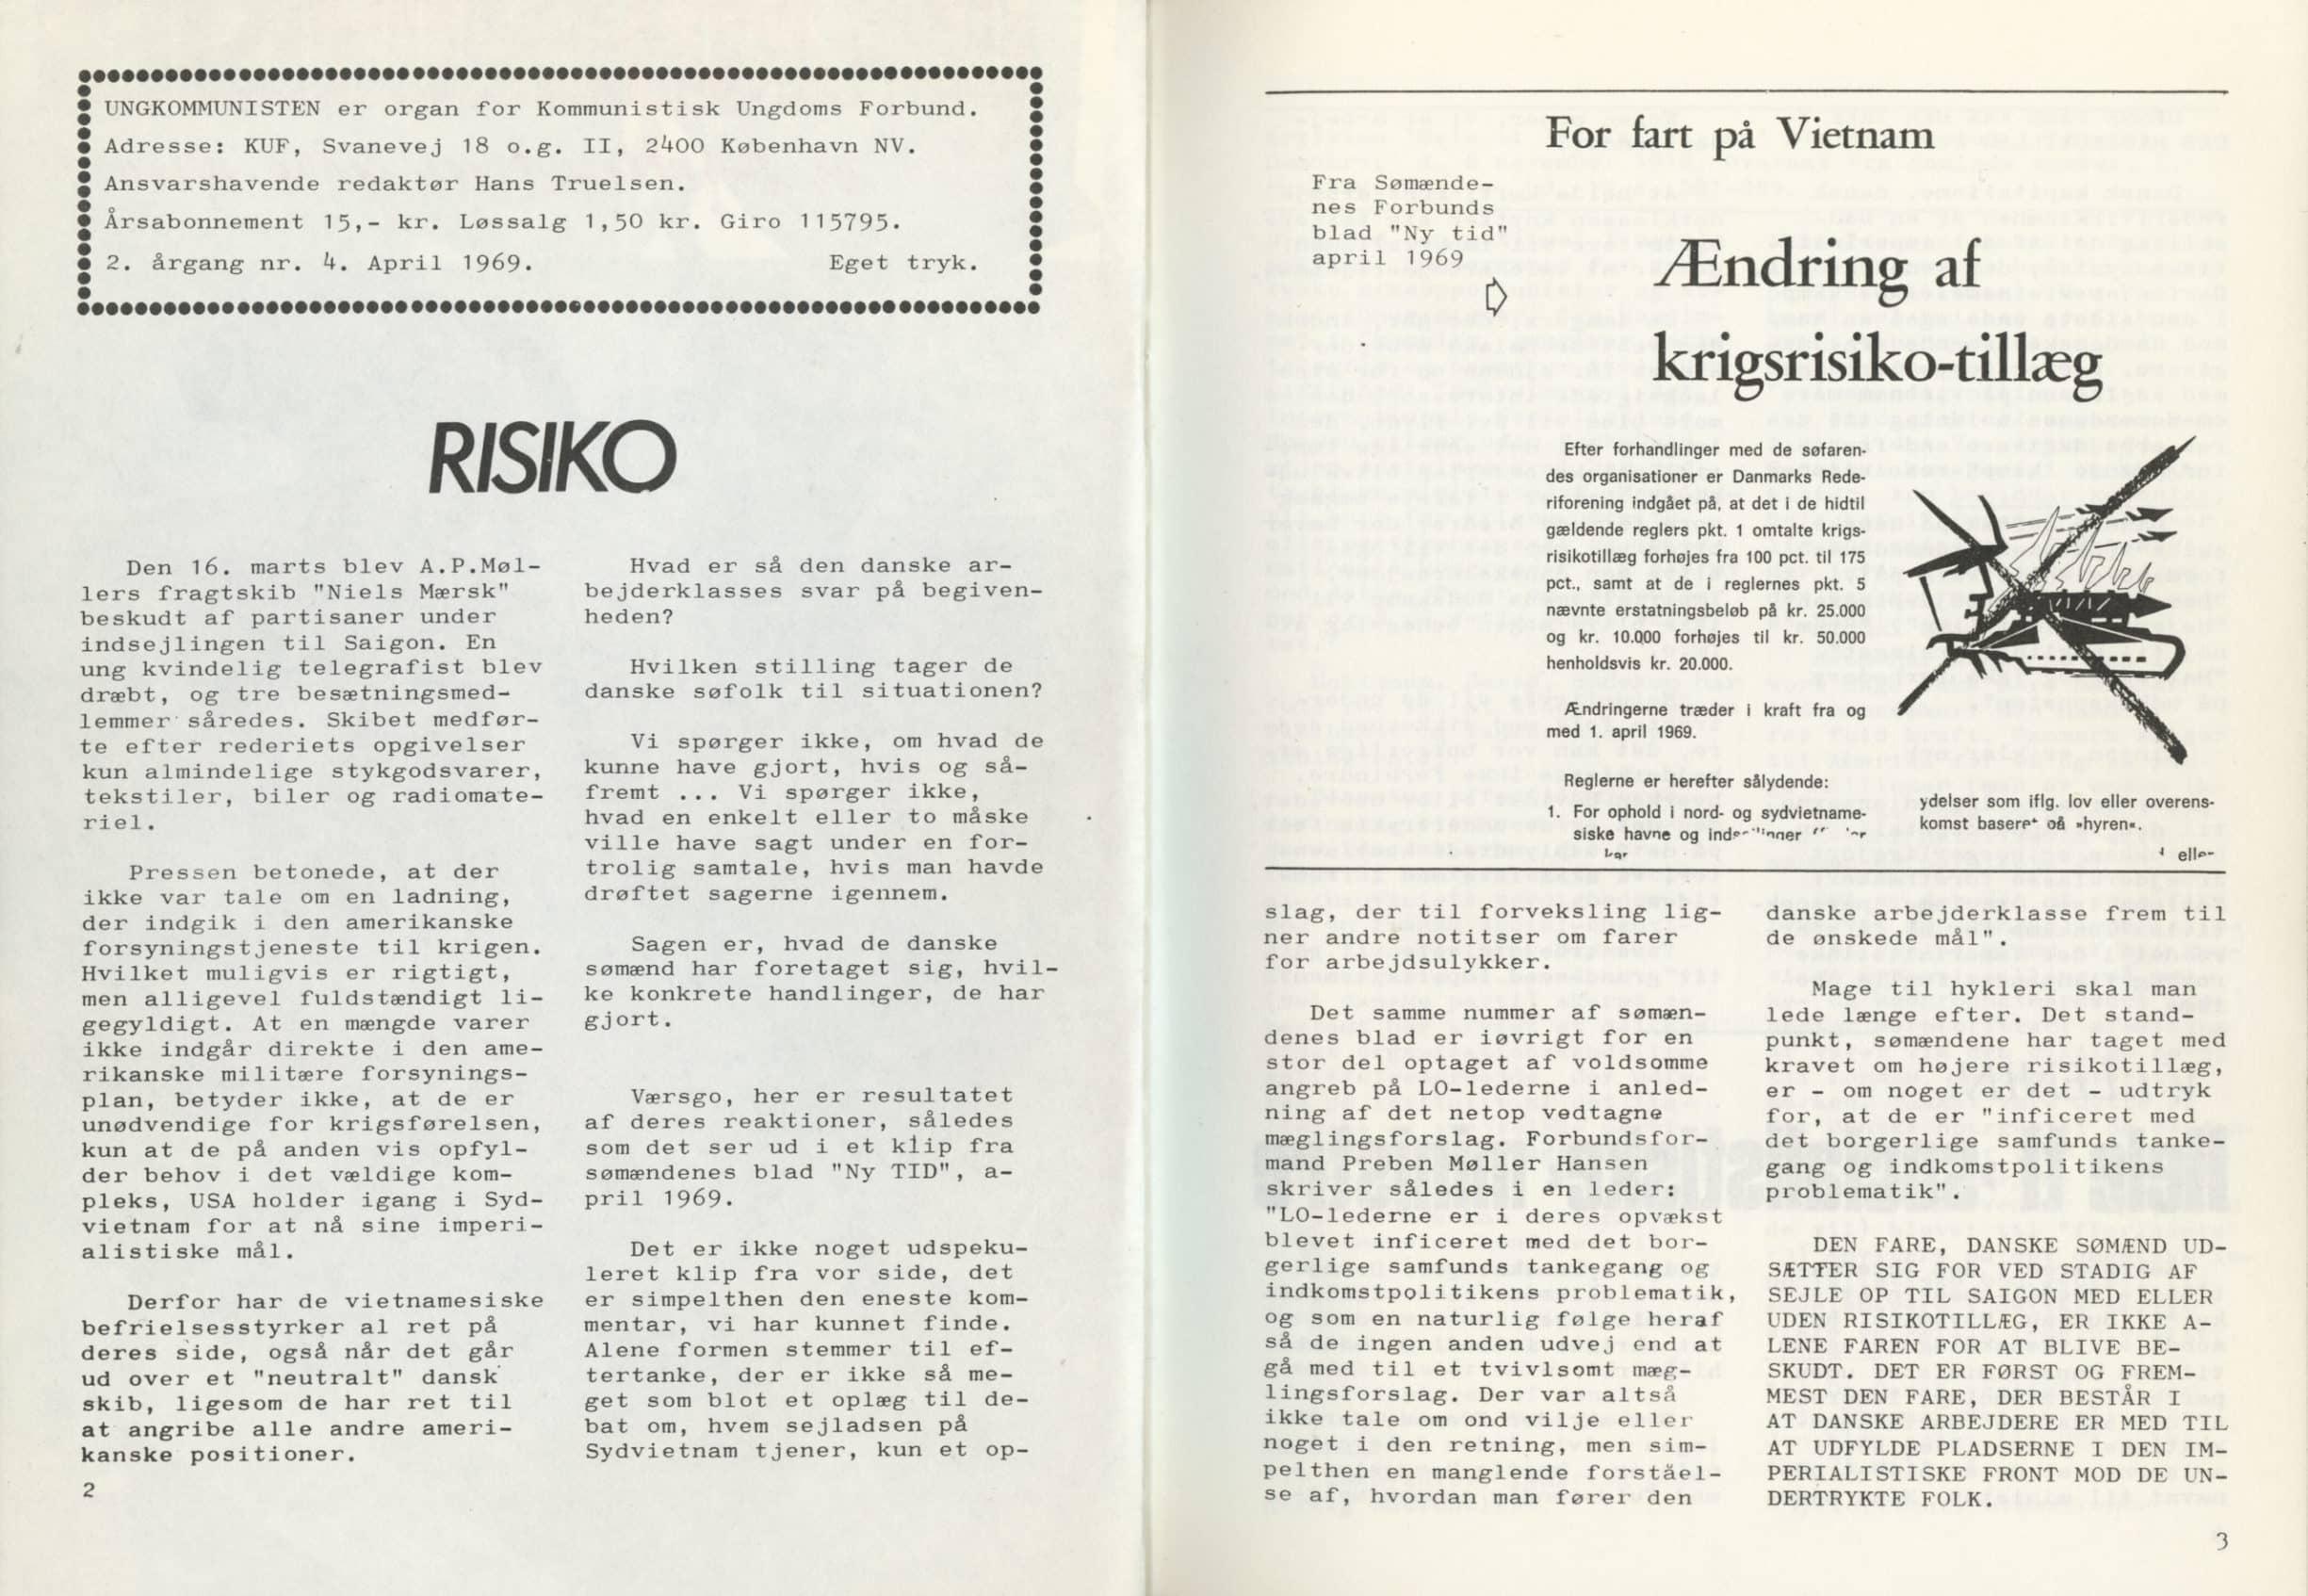 Ungkommunisten 1969, nr. 4, s. 2-3.